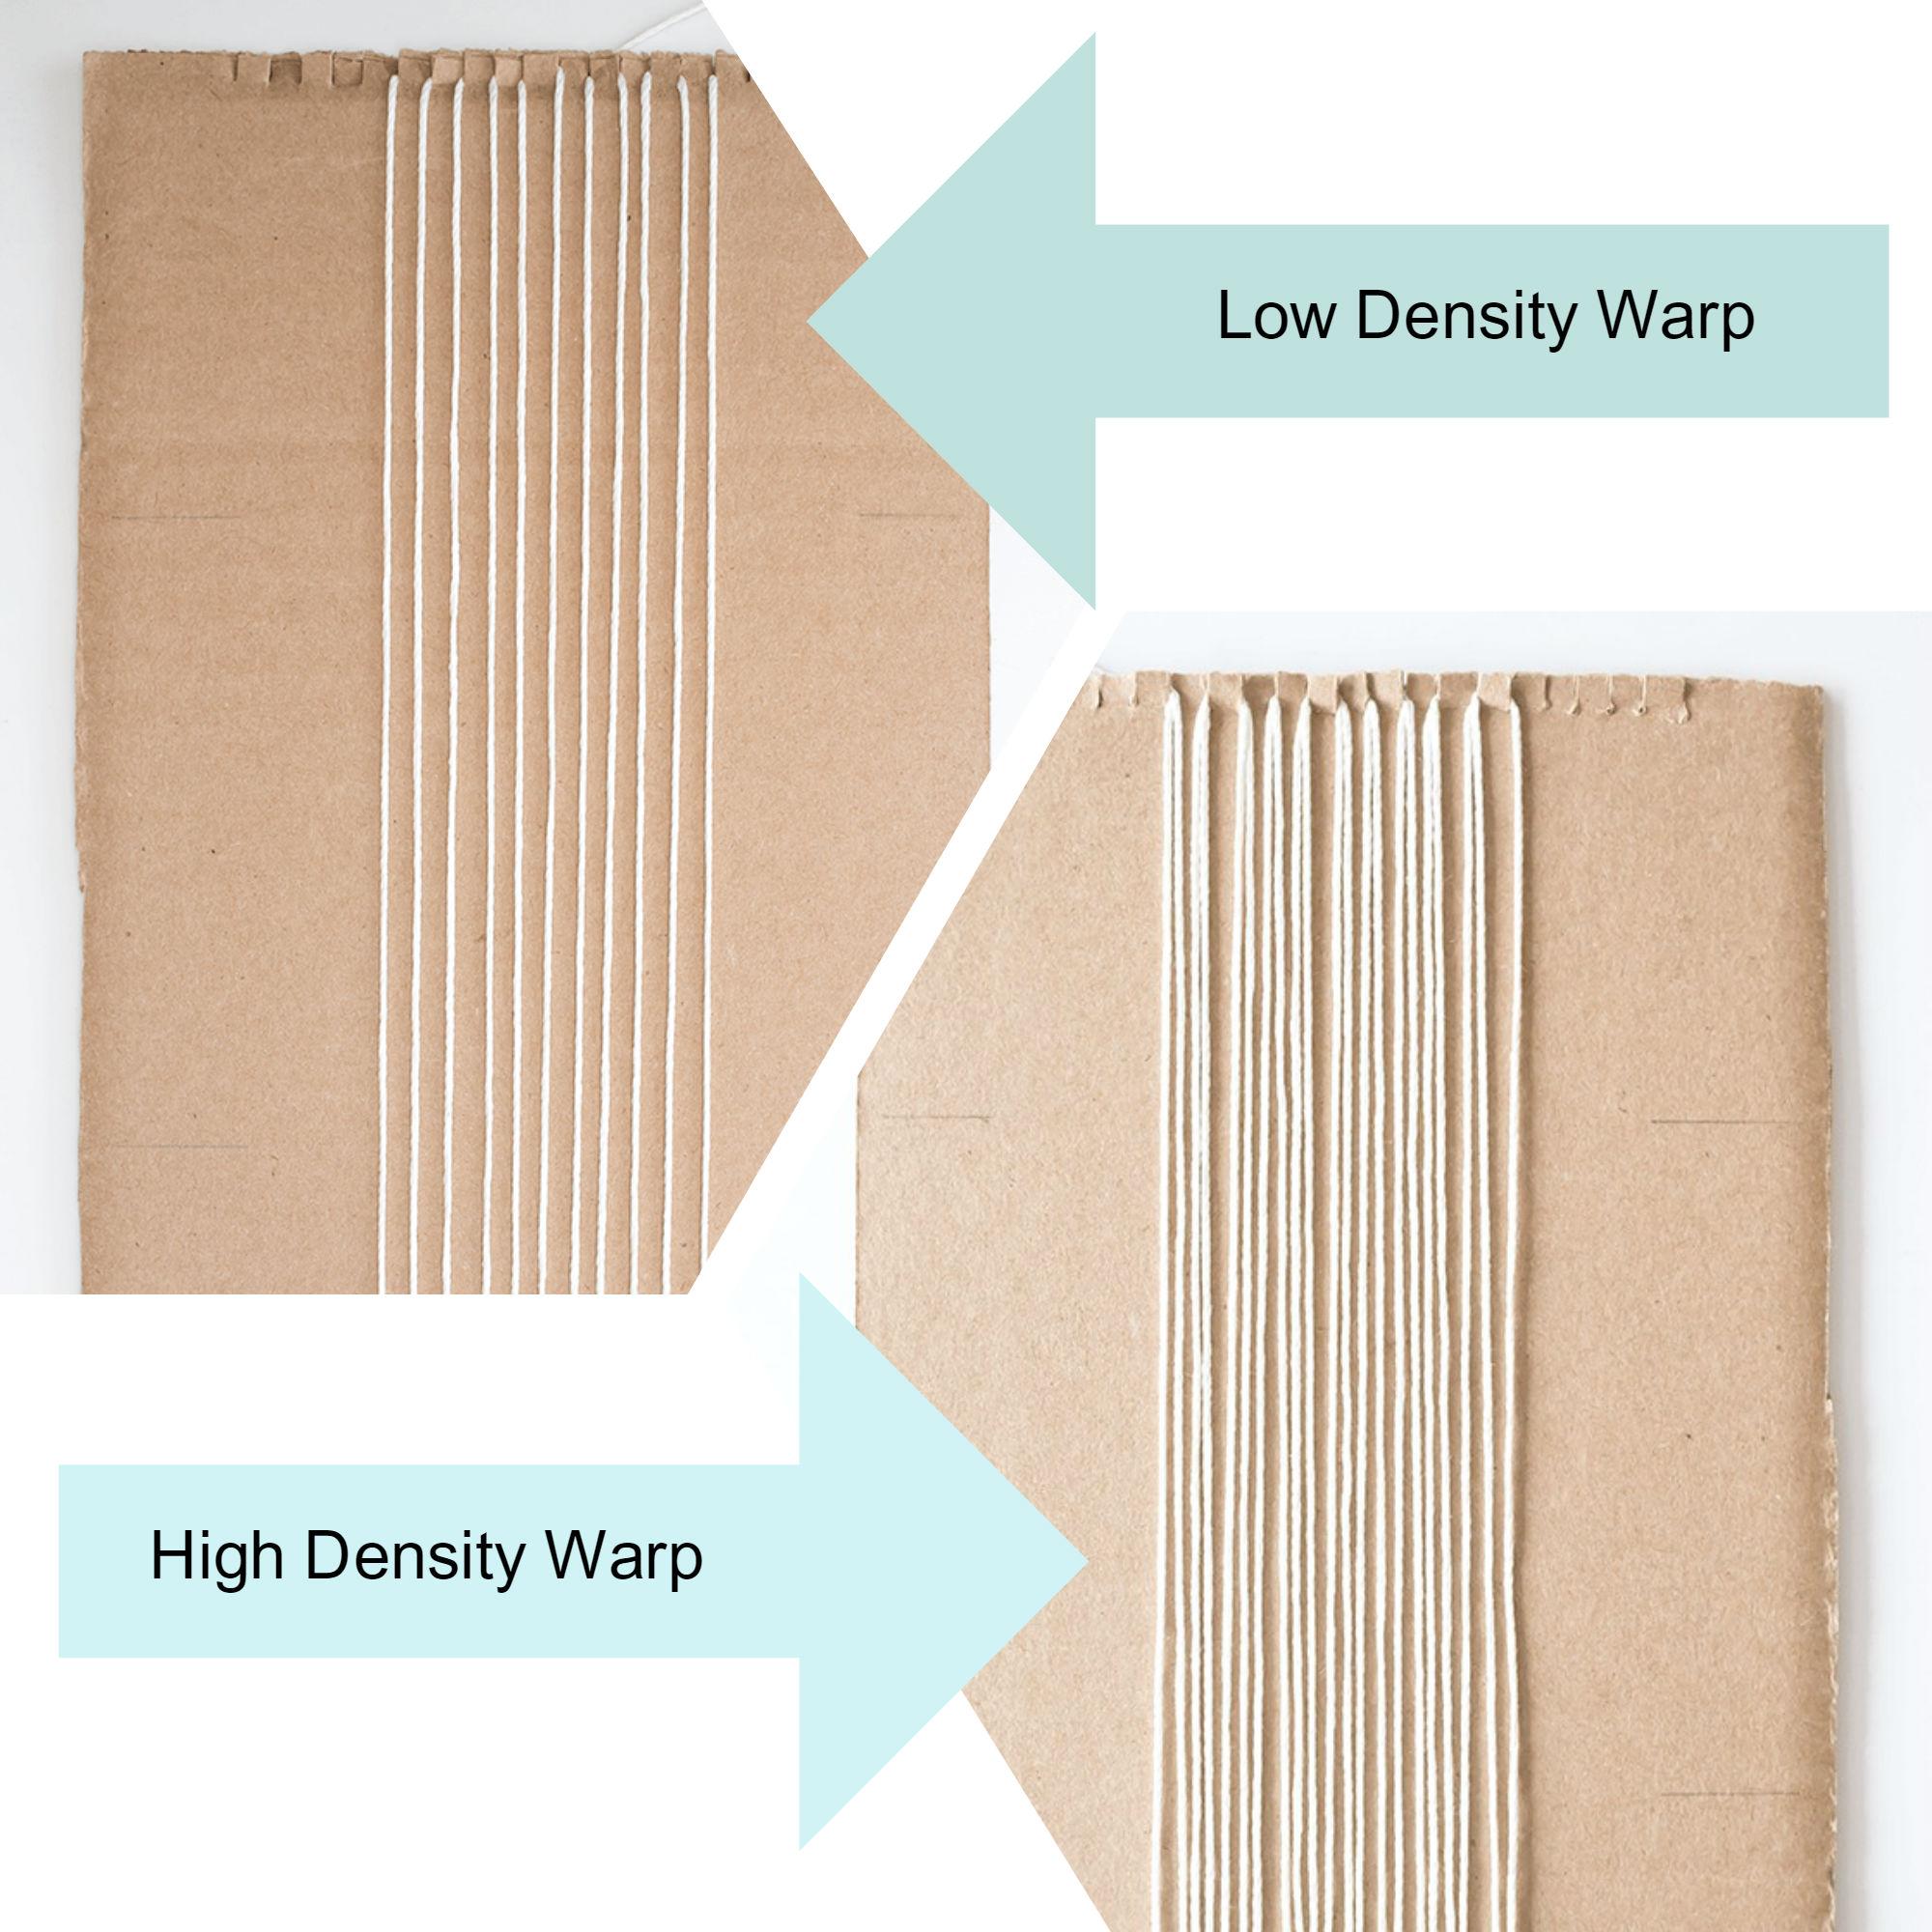 Low Vs High Density Warp Comparison